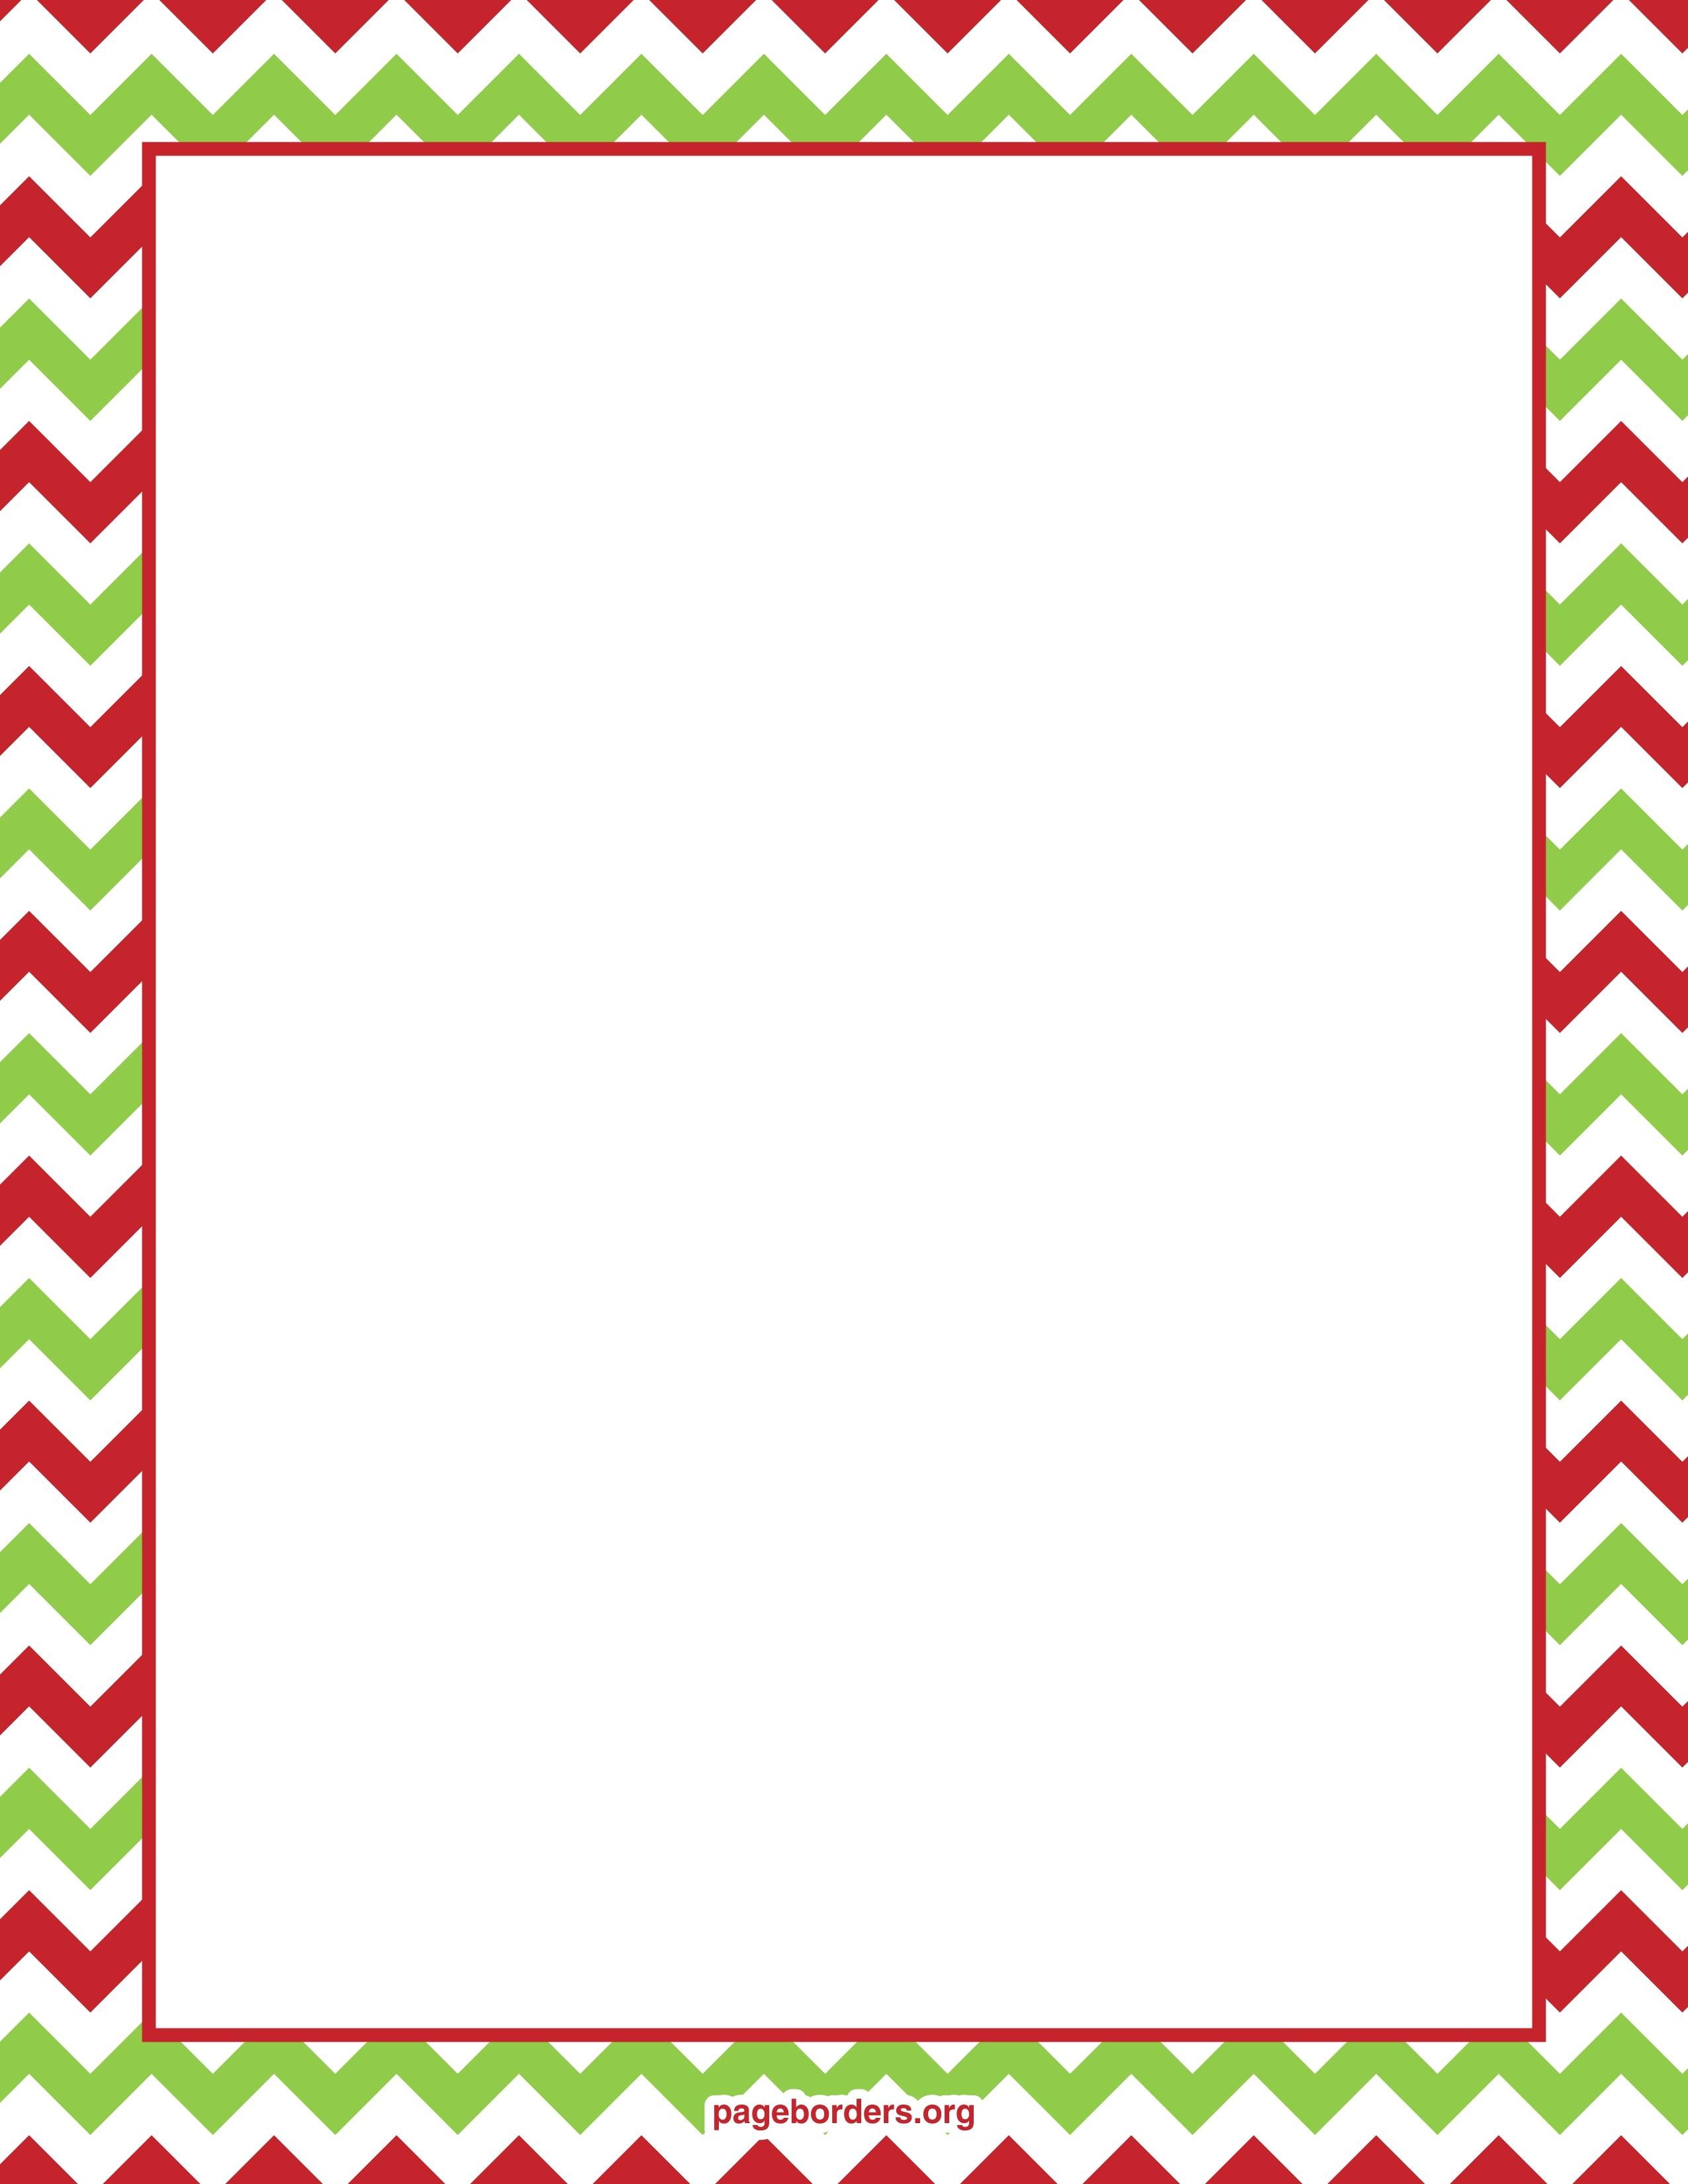 Holiday clipart border 4 » Clipart Portal.